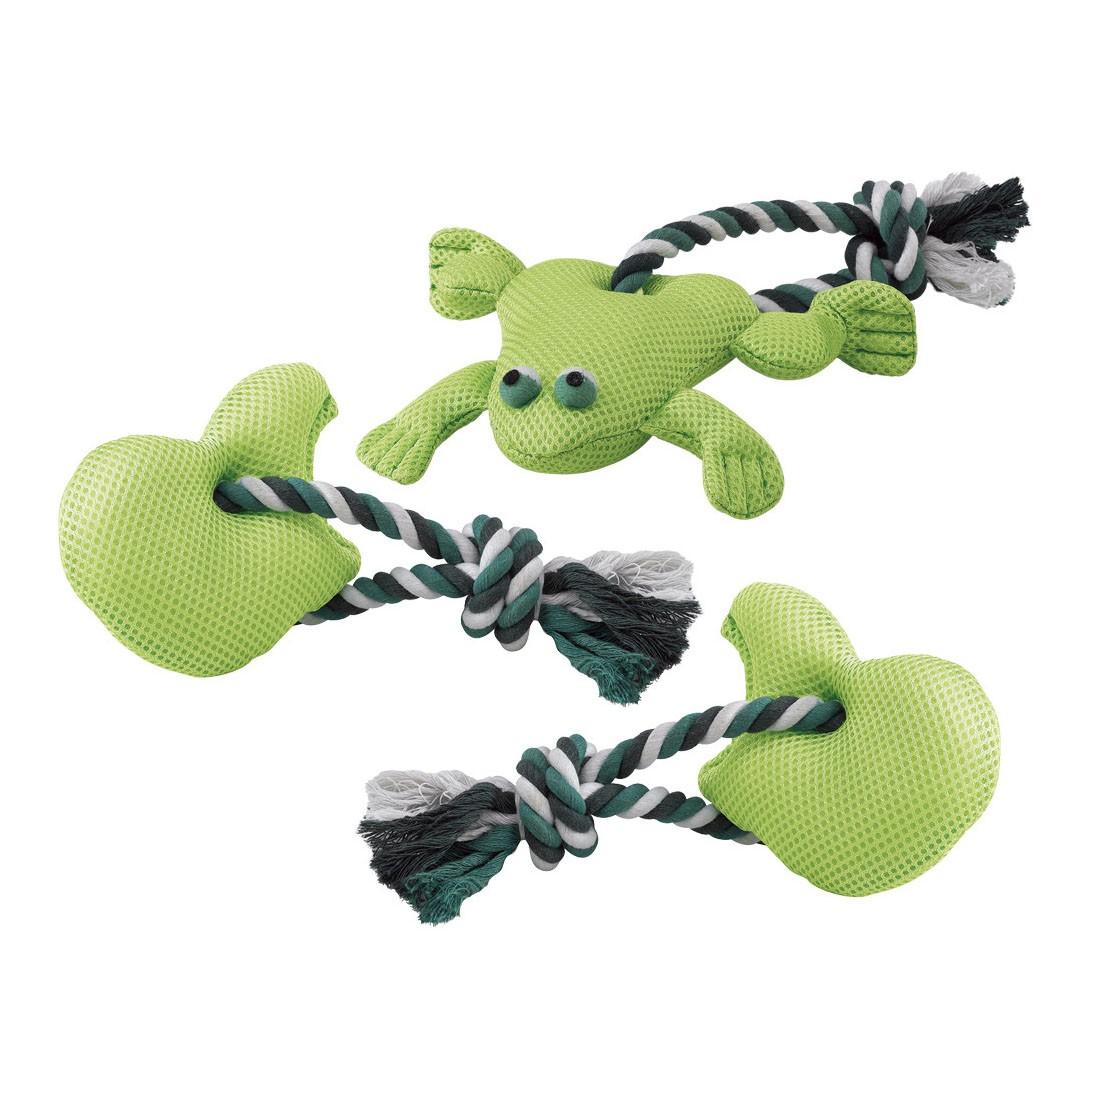 Brinquedo com Apito Interno PA 6515